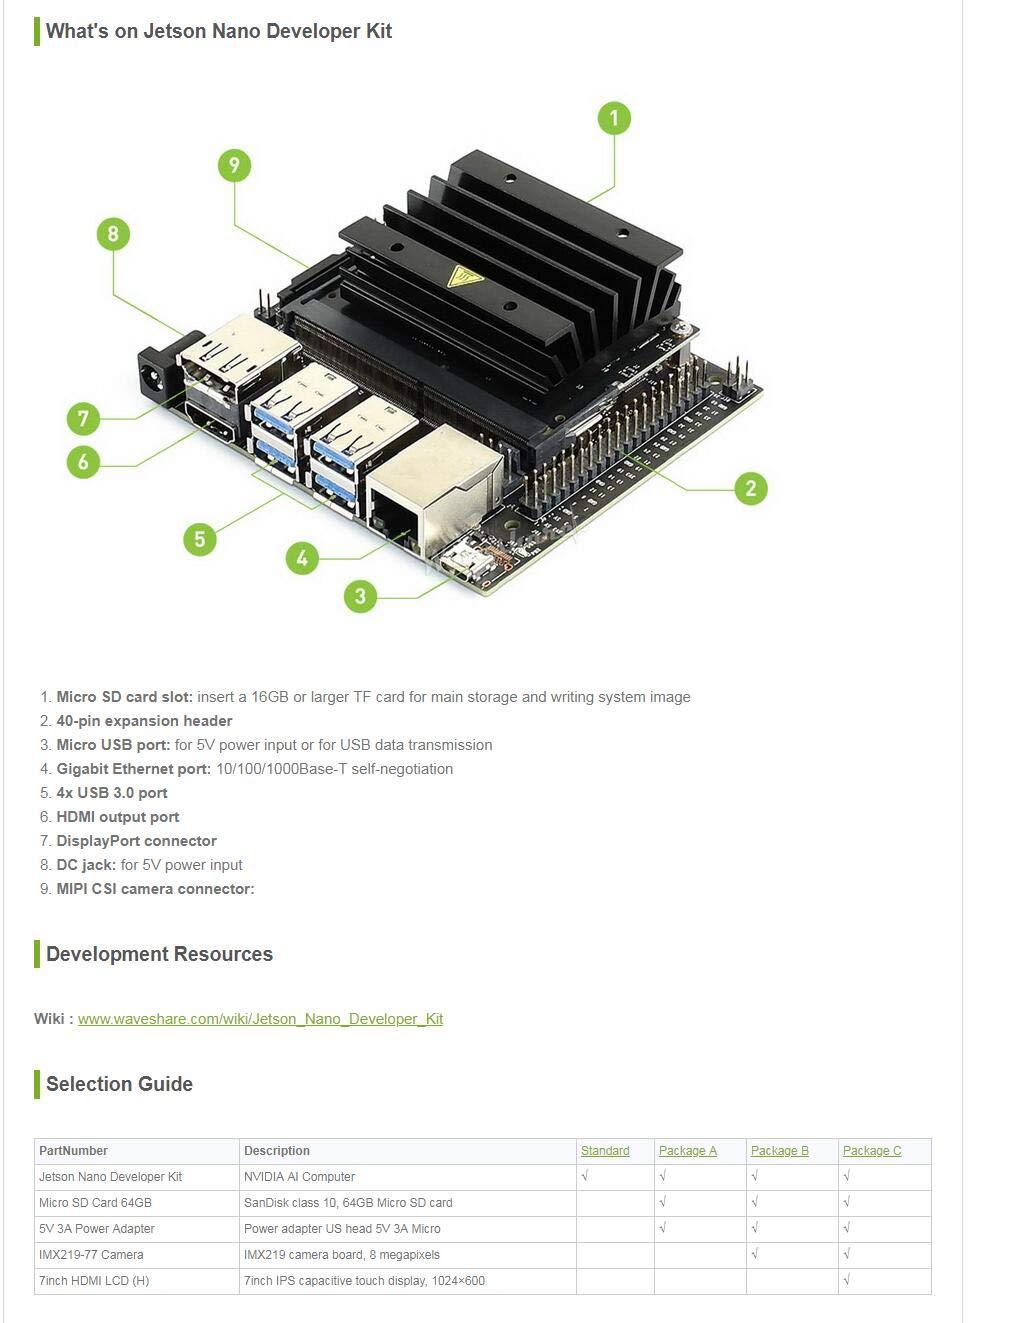 Waveshare NVIDIA Jetson Nano Developer Kit Small Powerful Computer